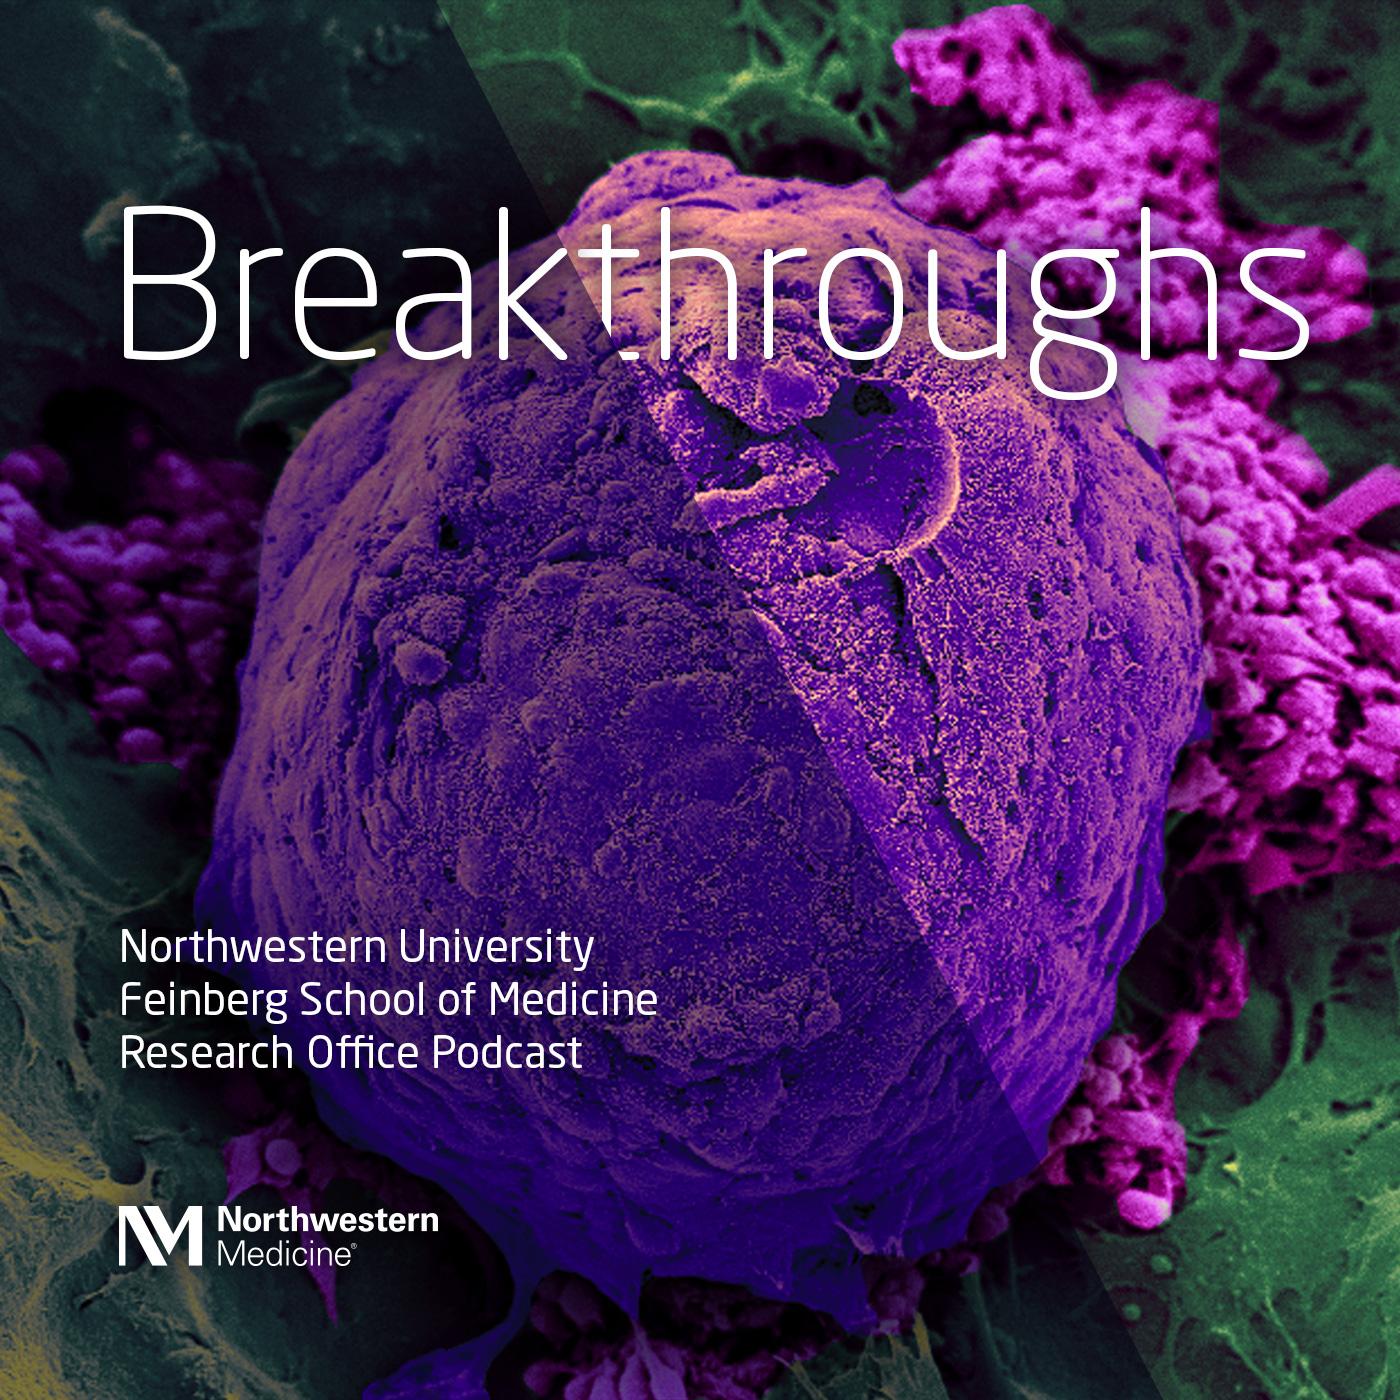 Breakthroughs show art